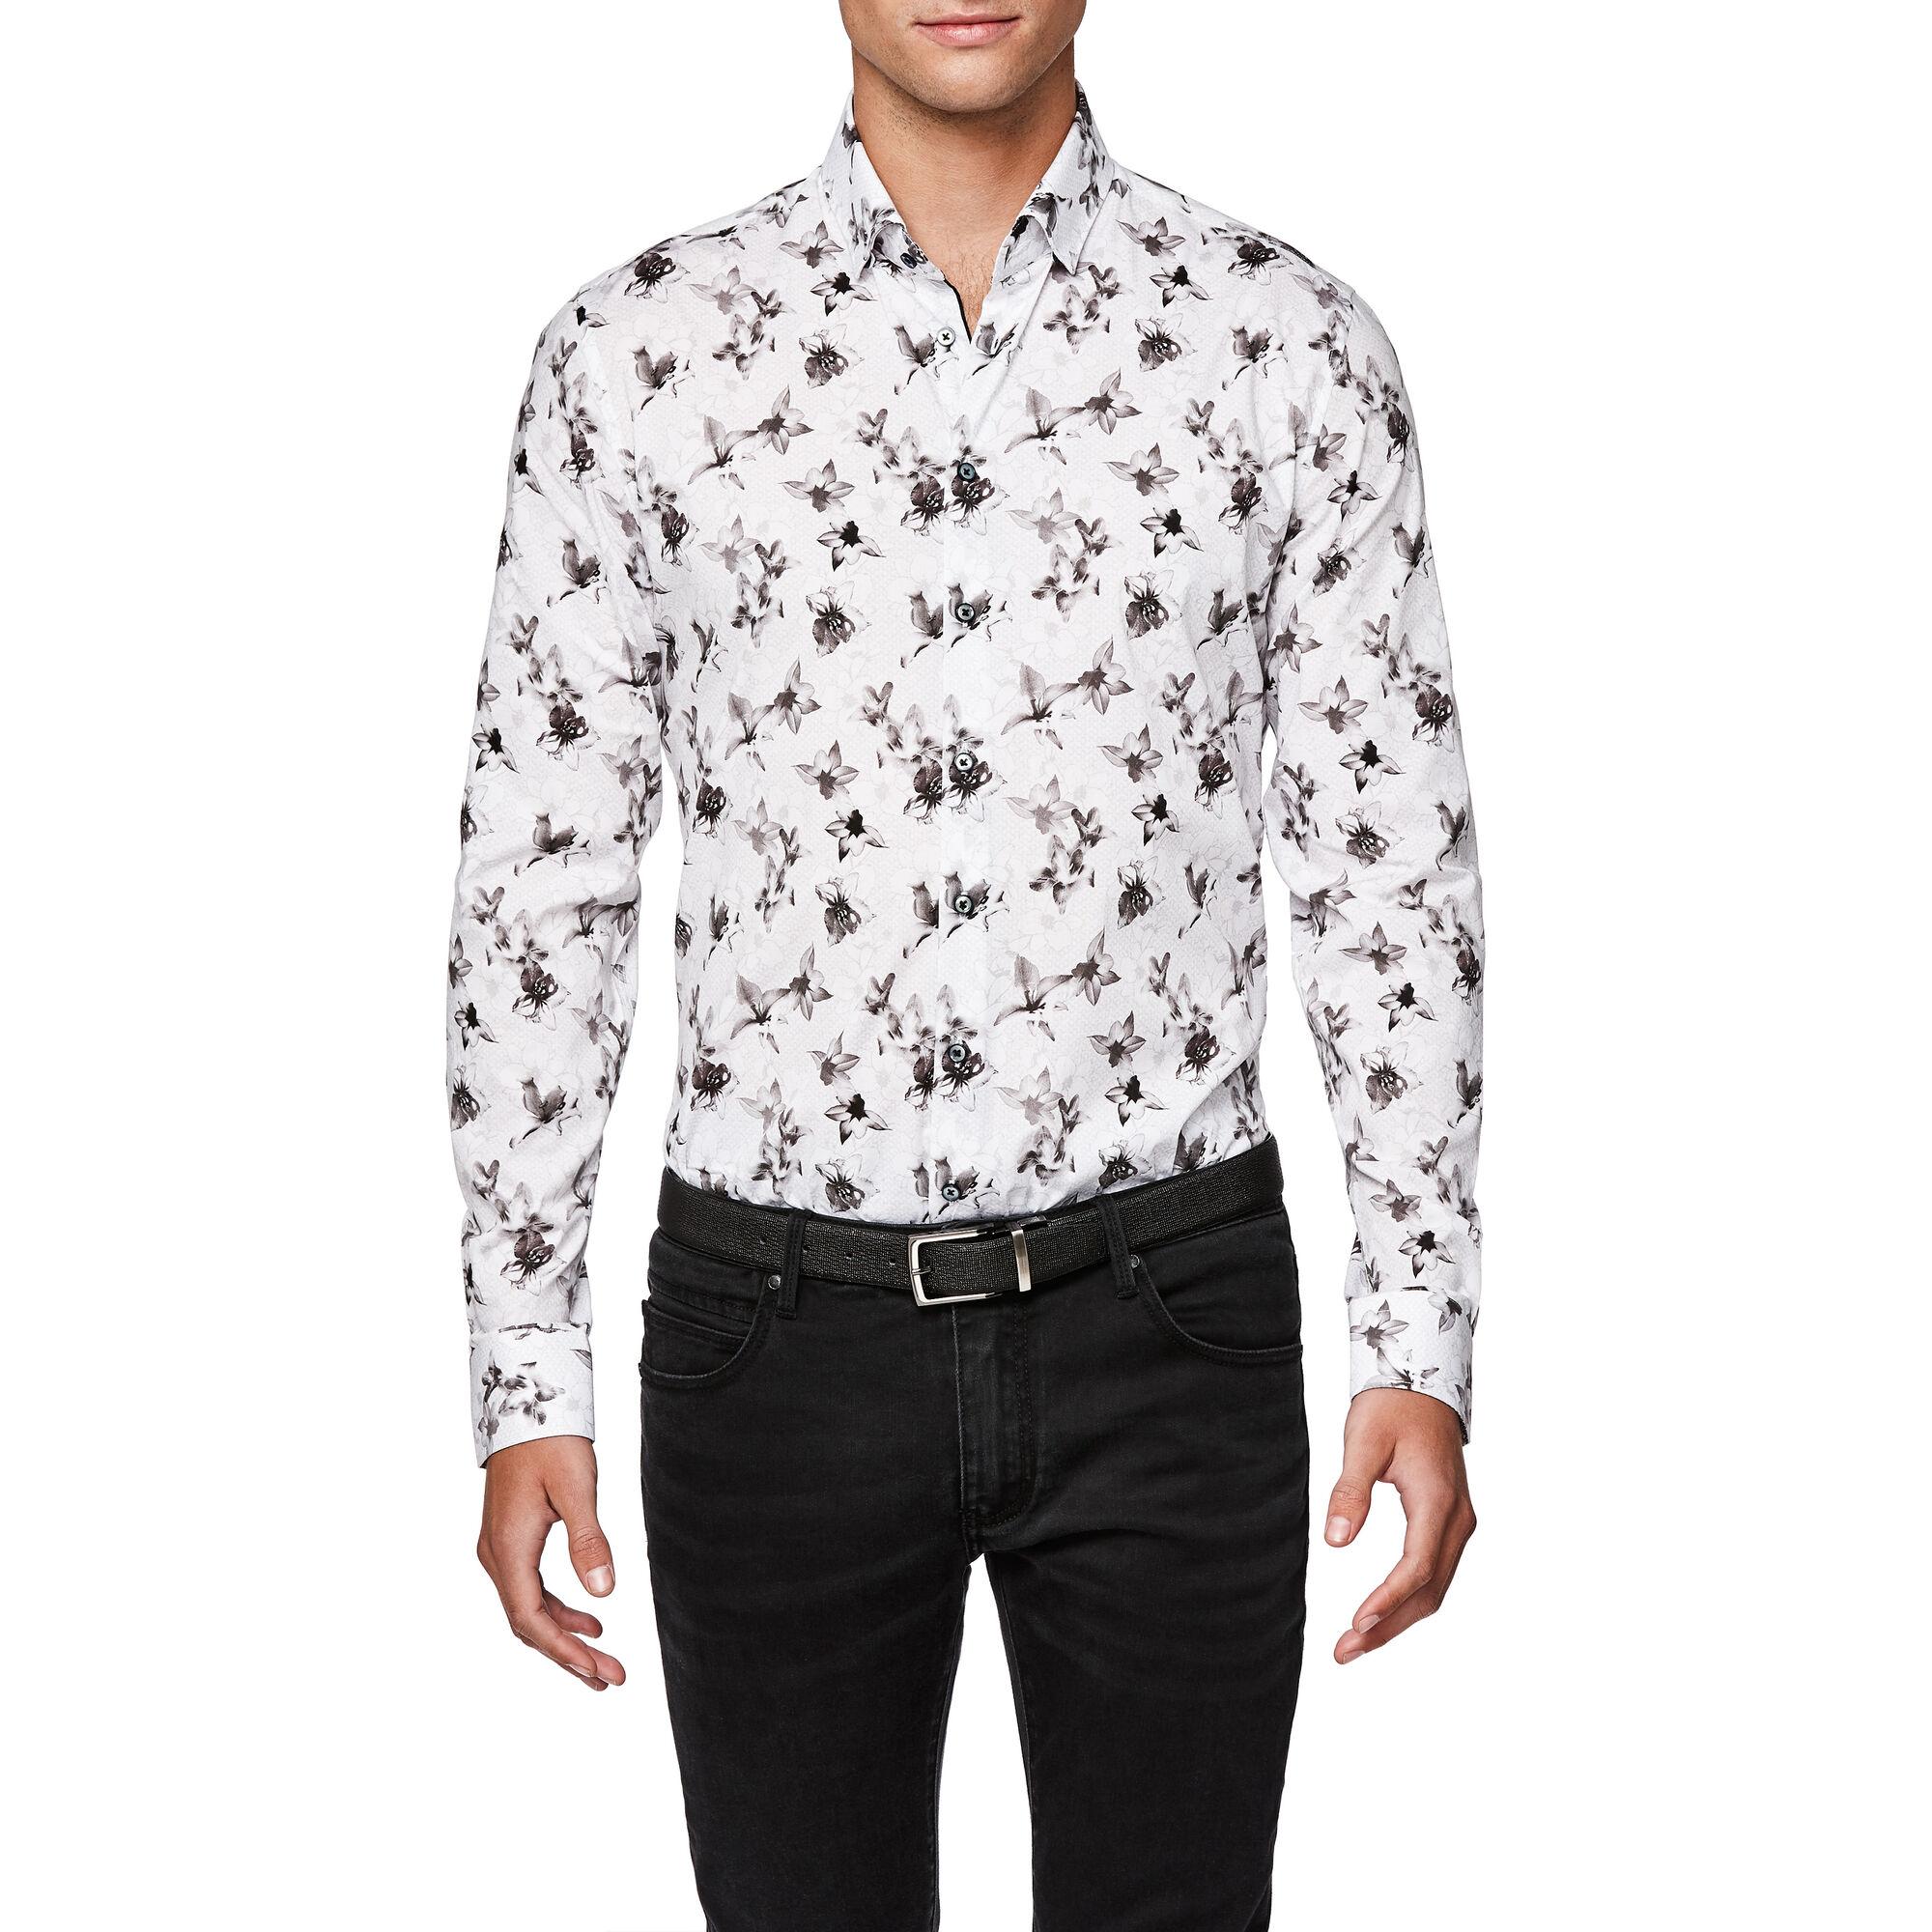 9f86834a751a07 Bate - White/Silver - L/S Floral Button Down Shirt | Politix